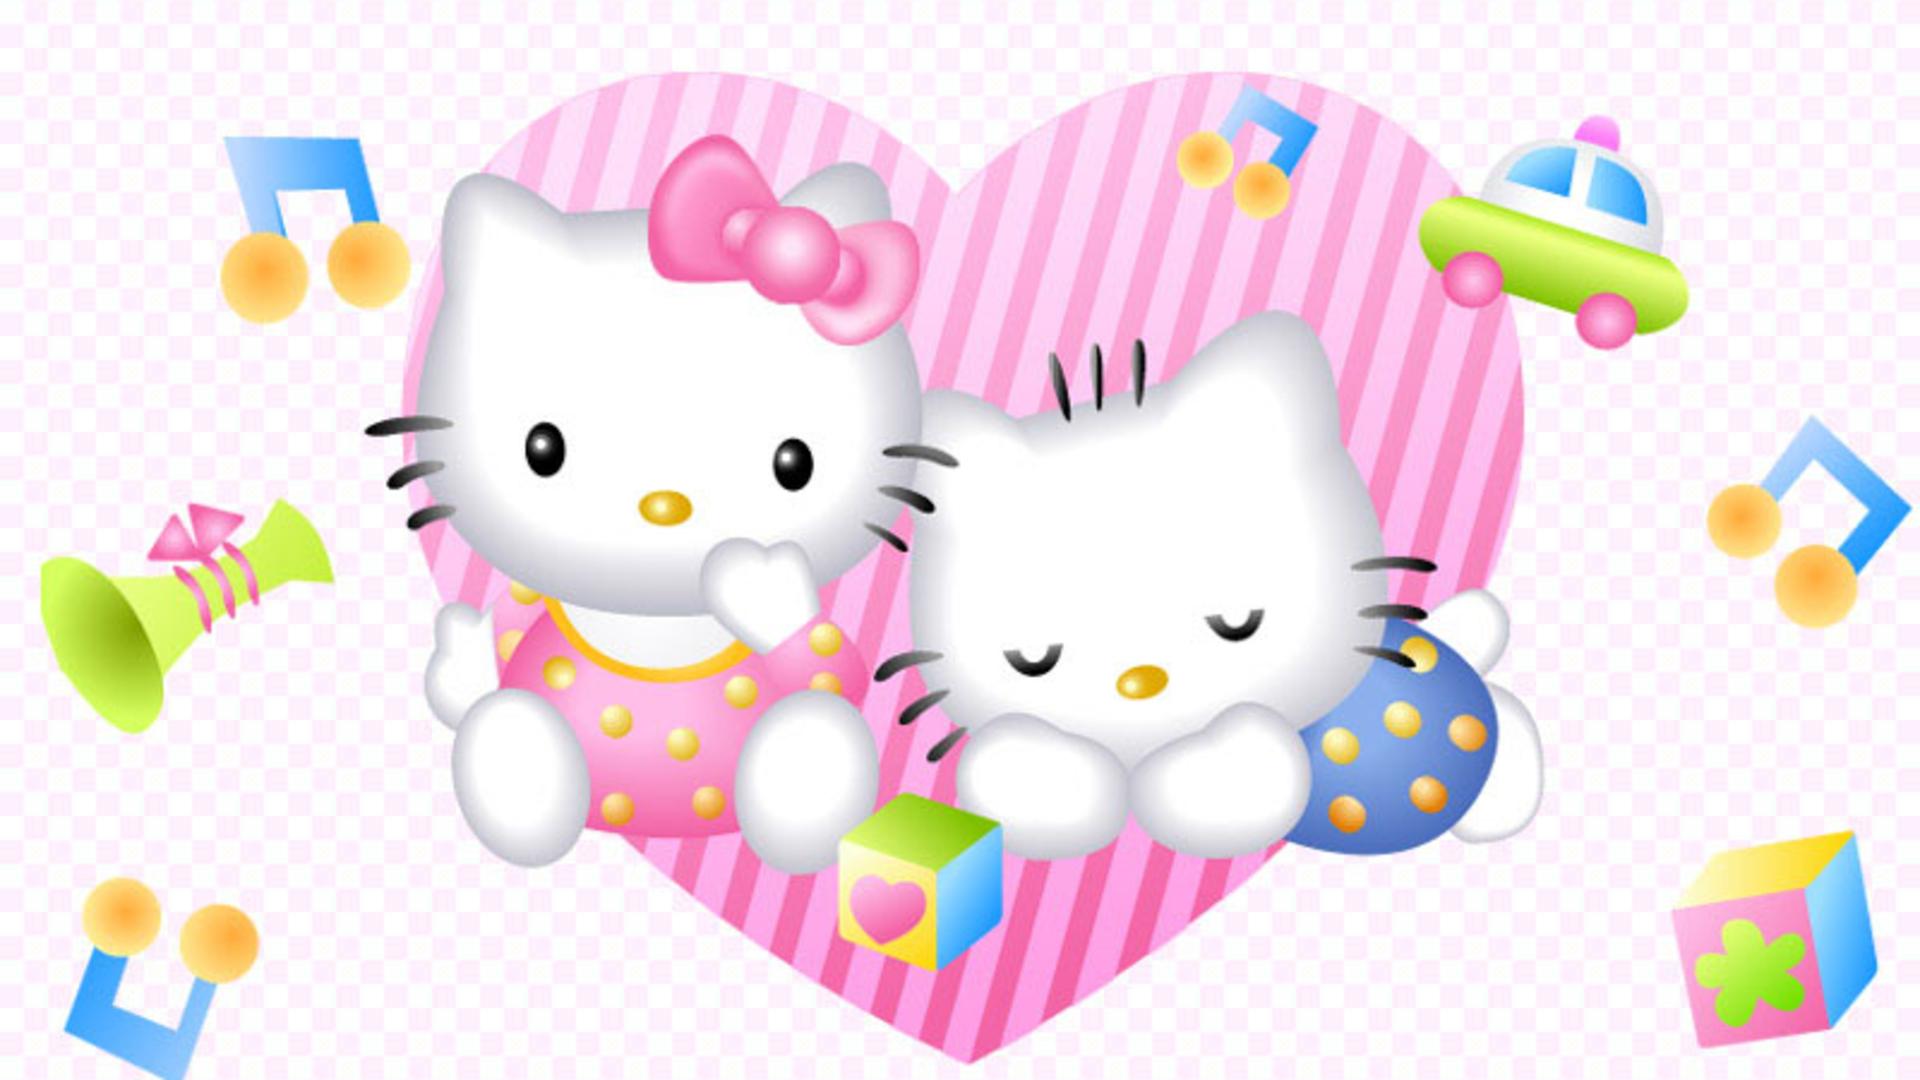 Hello Kitty Wallpapers Wallpapers 4 U